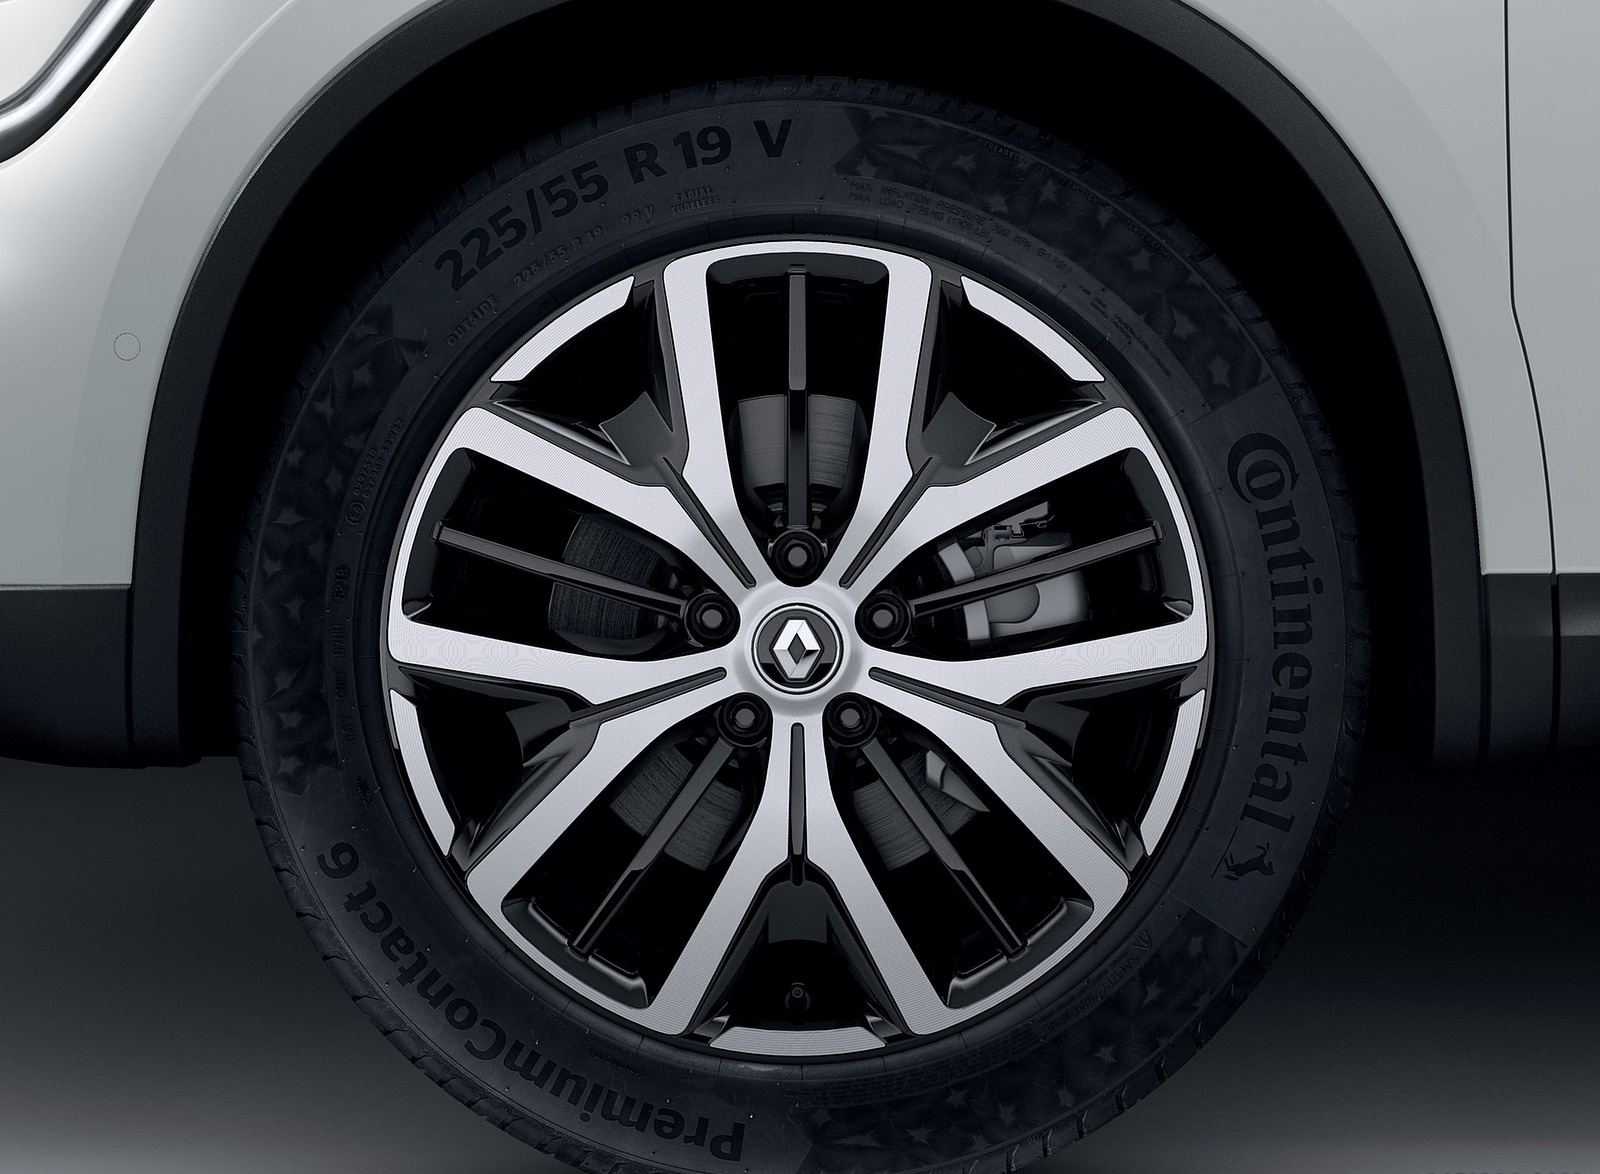 2020 Renault Koleos Wheel Wallpapers (8)